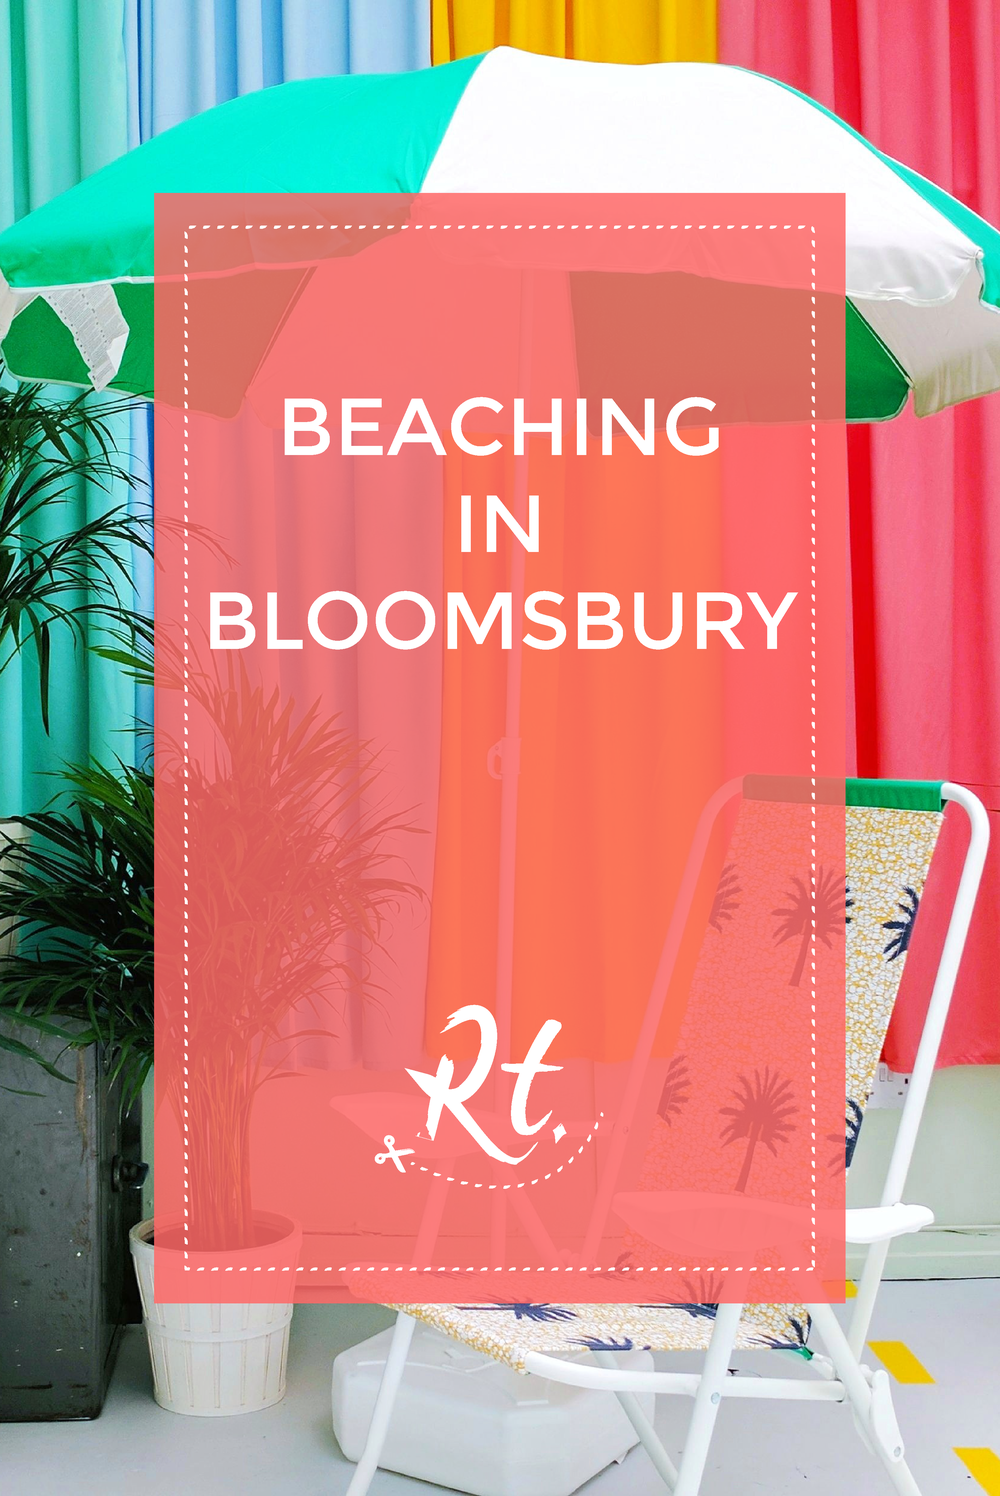 Beaching in Bloomsbury by Rosh Thanki, Yinka Ilori interior design at Plinth Gallery.png